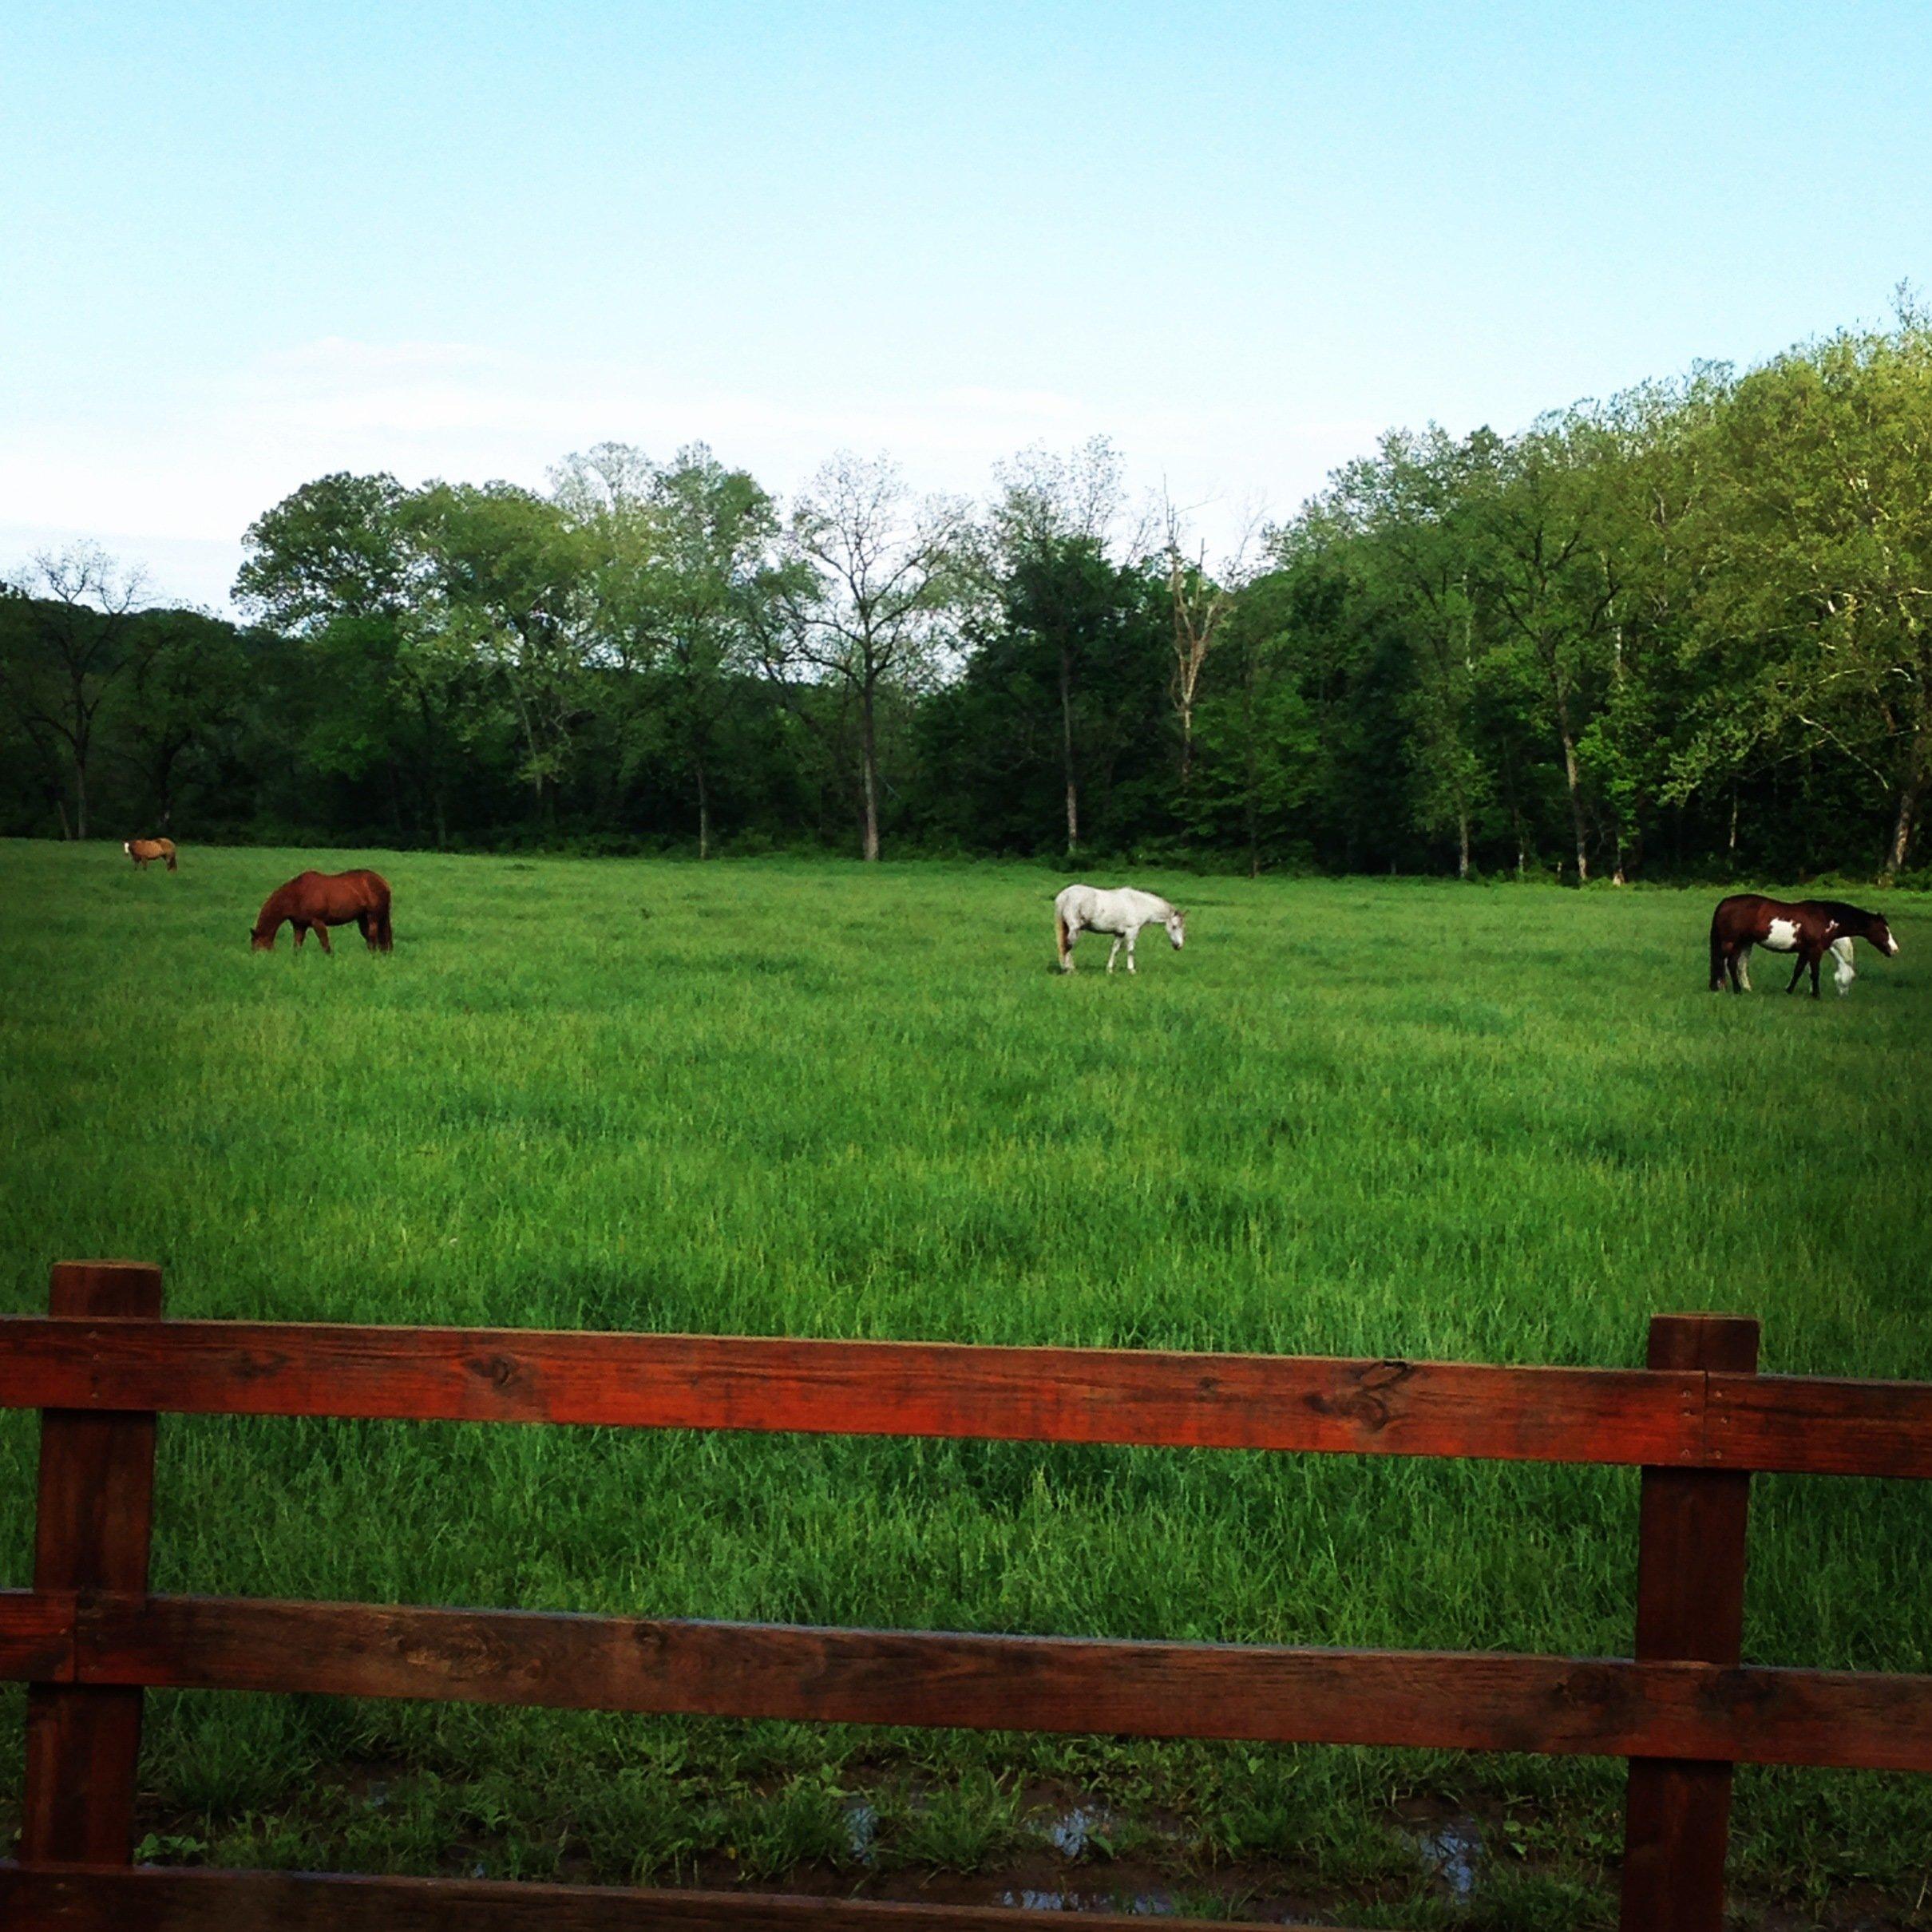 horses grazing in Foristell, MO